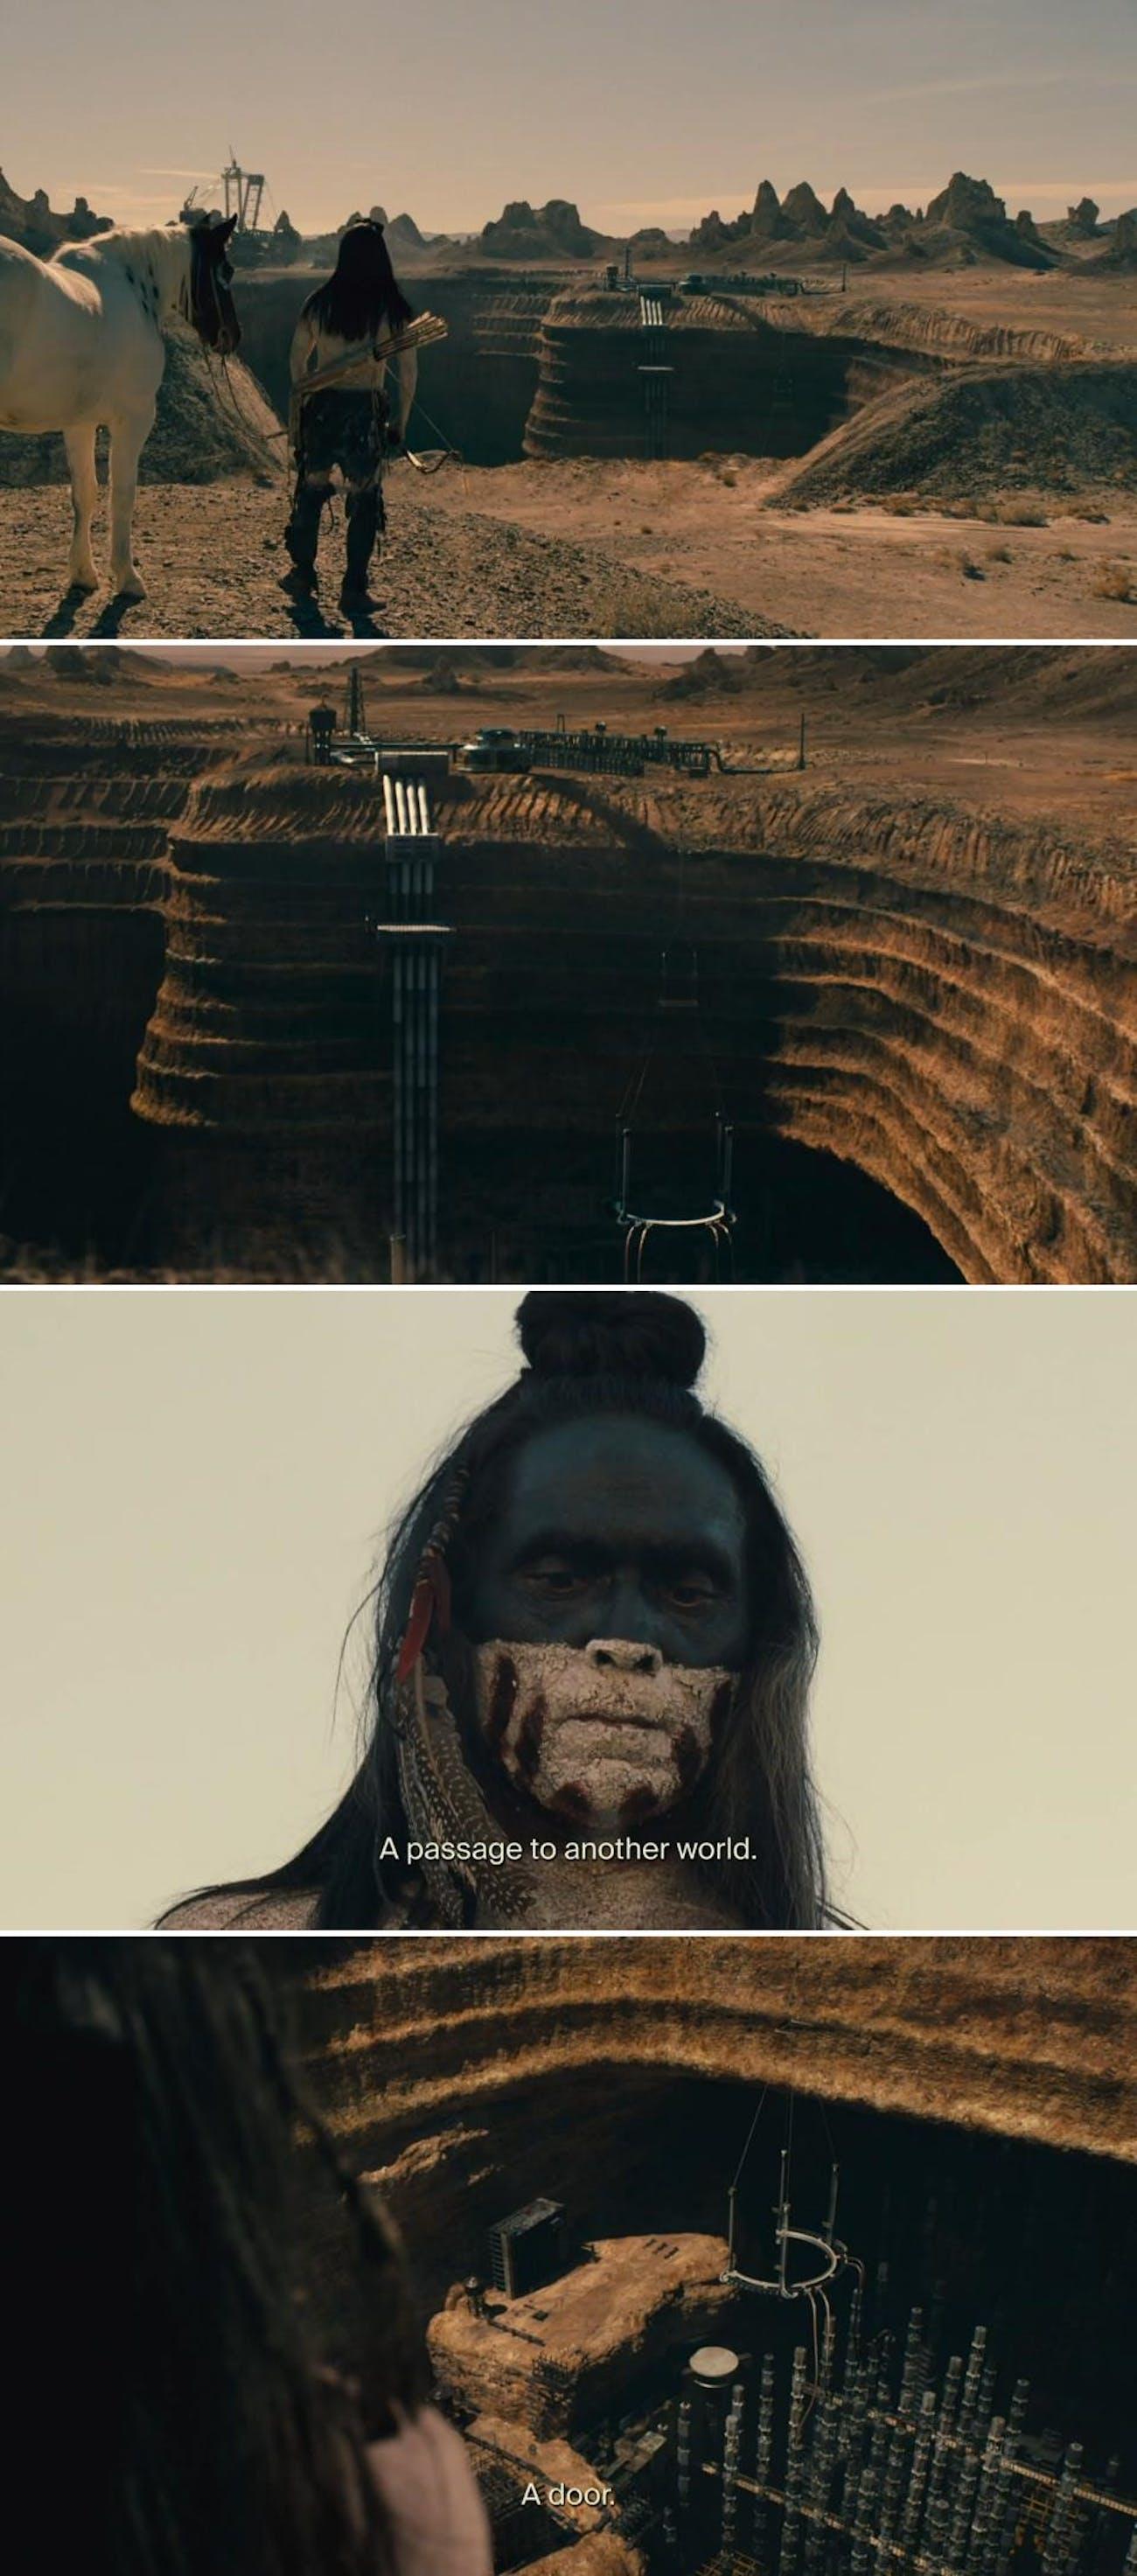 westworld season 2 spoilers